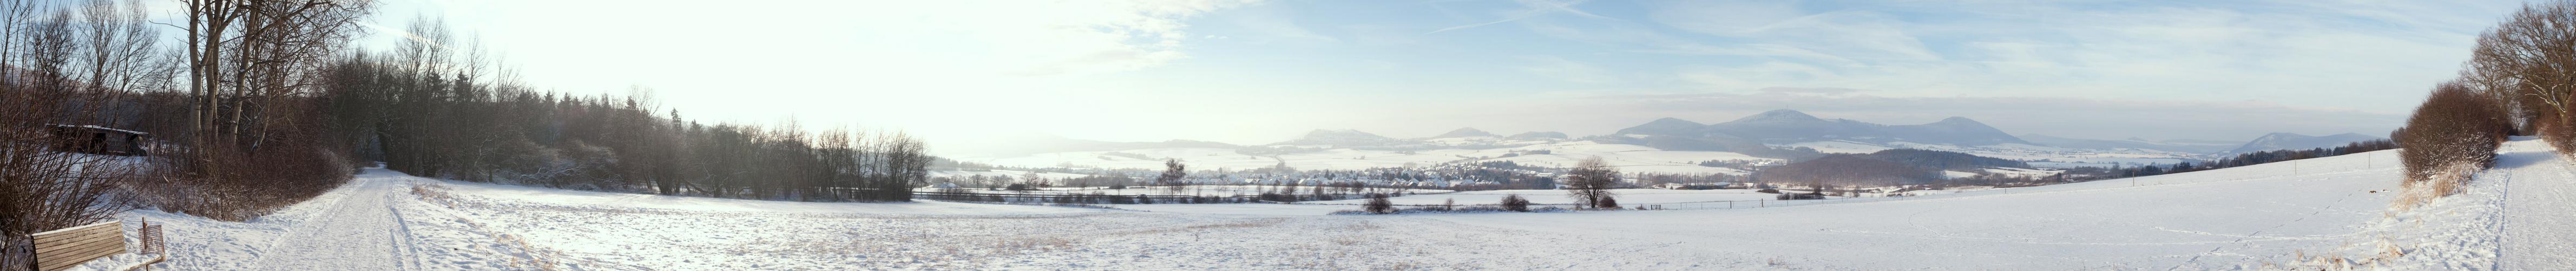 Winter-Panorama über dem Warmetal